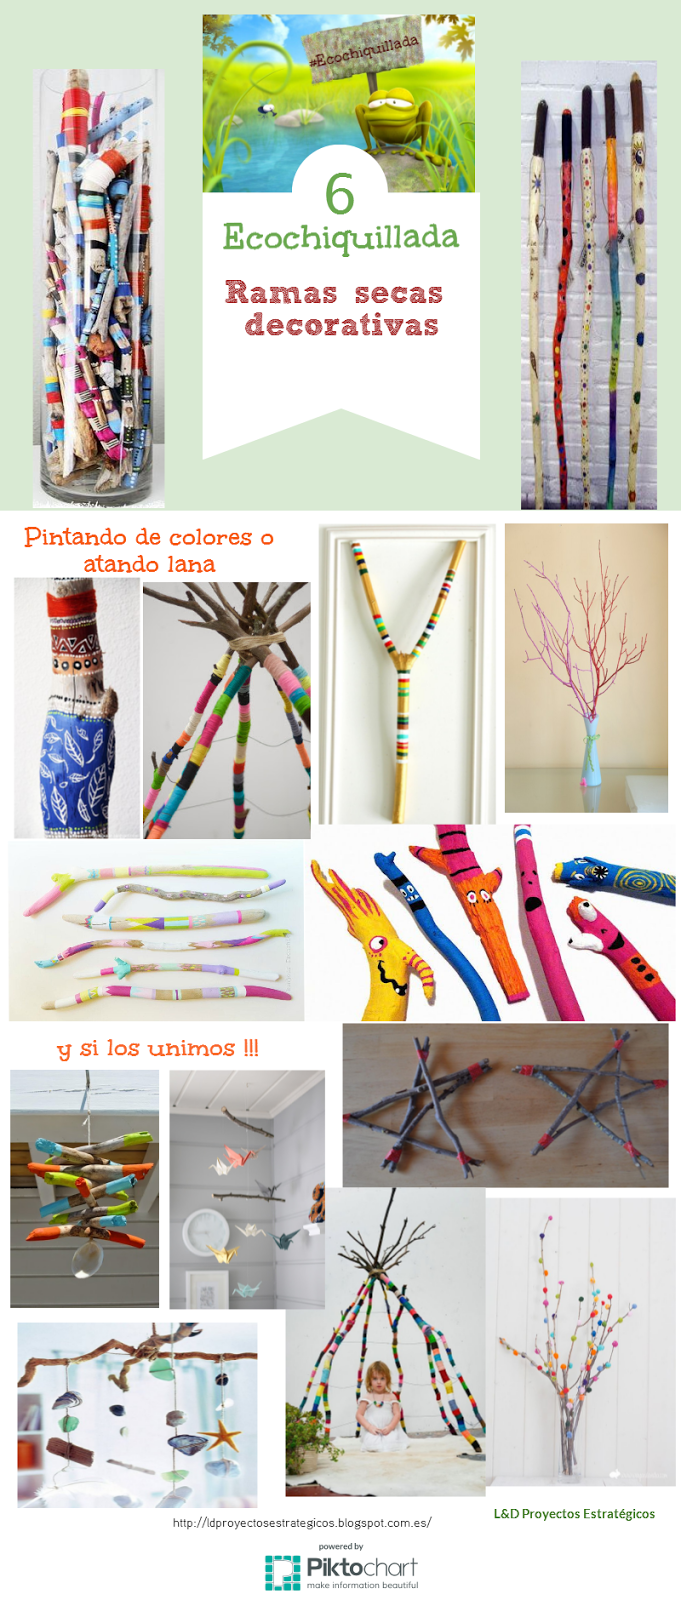 #ecochiquillada - Magazine cover